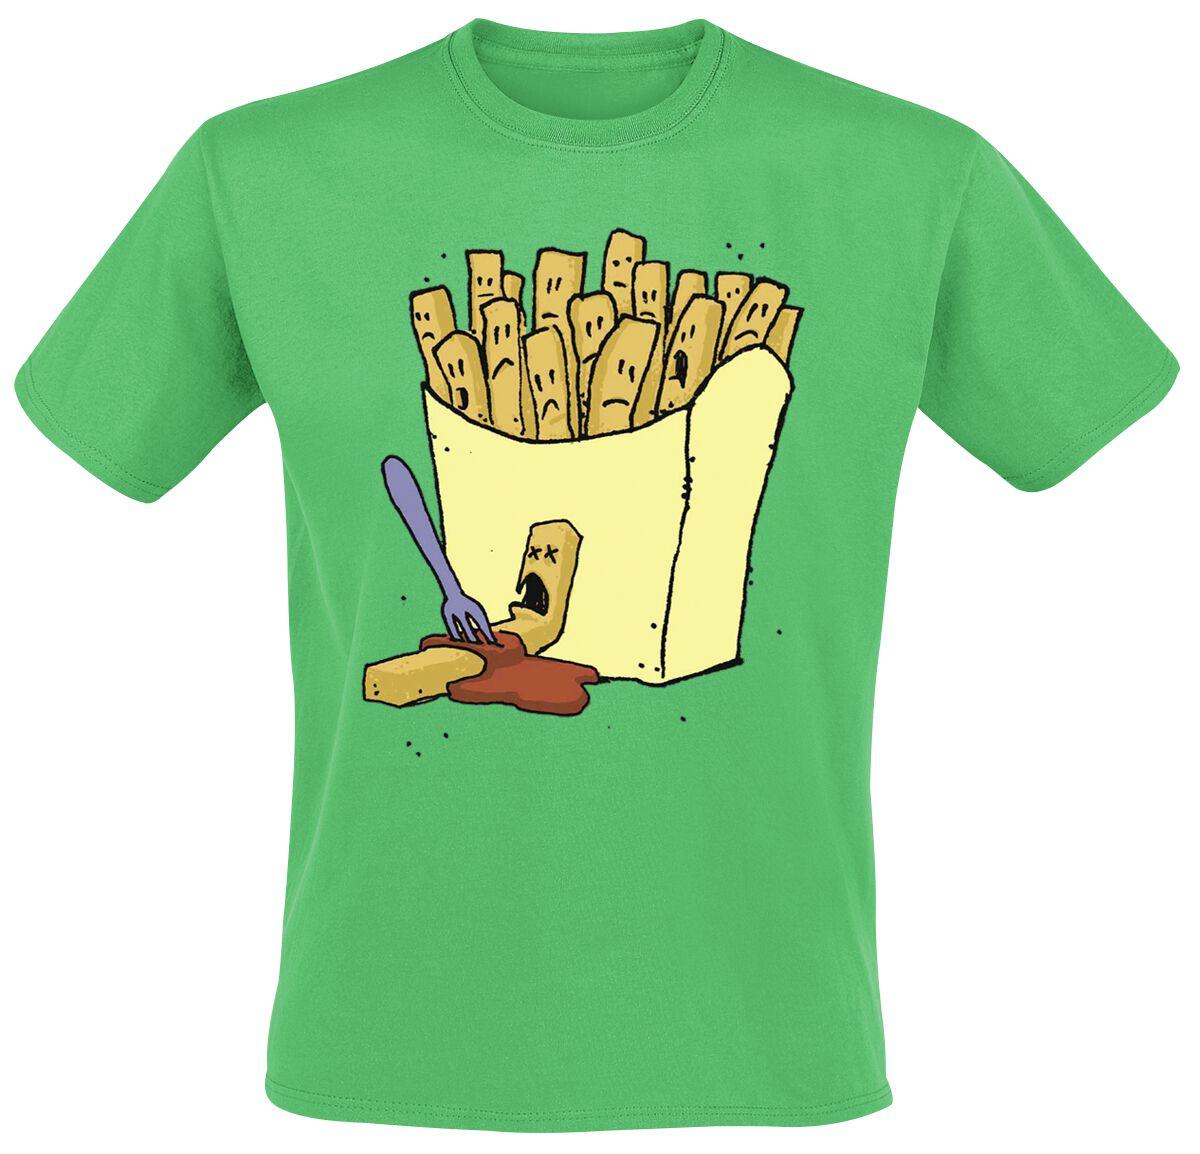 Fun Shirts - Koszulki - T-Shirt Chips Murder T-Shirt zielony - 200884